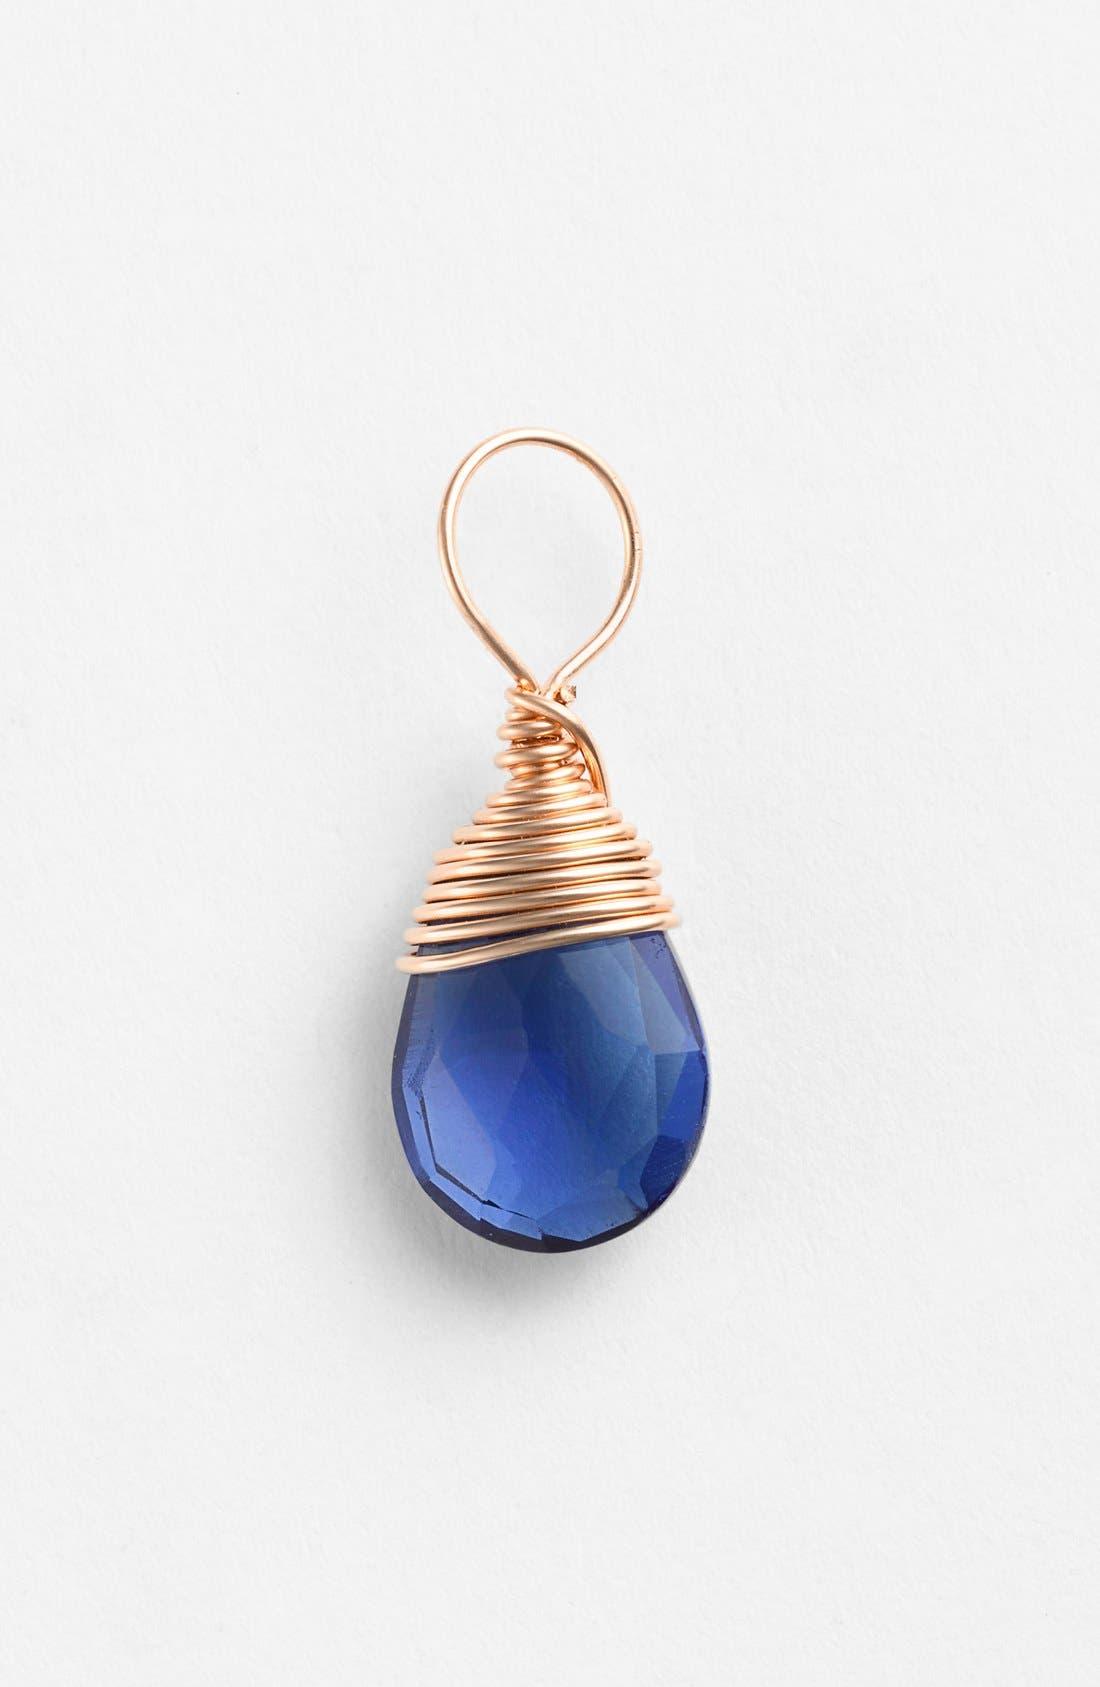 Alternate Image 1 Selected - Nashelle 14k-Rose Gold Fill & Semiprecious Stone Charm